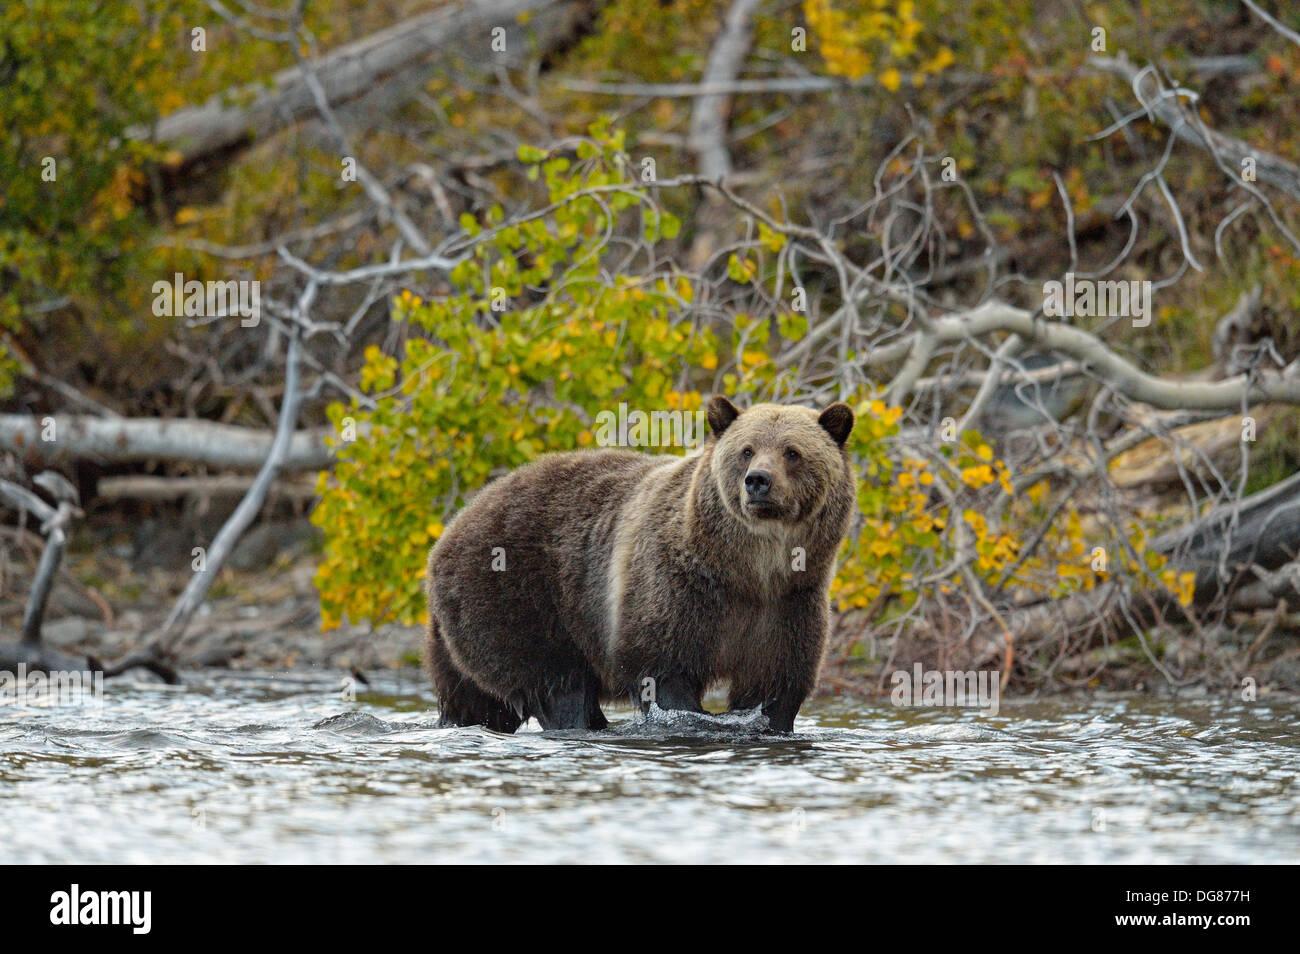 Grizzly bear, Ursus arctos, Feeding on fish during the autumn sockeye salmon spawning season Chilcotin Wilderness BC Canada - Stock Image